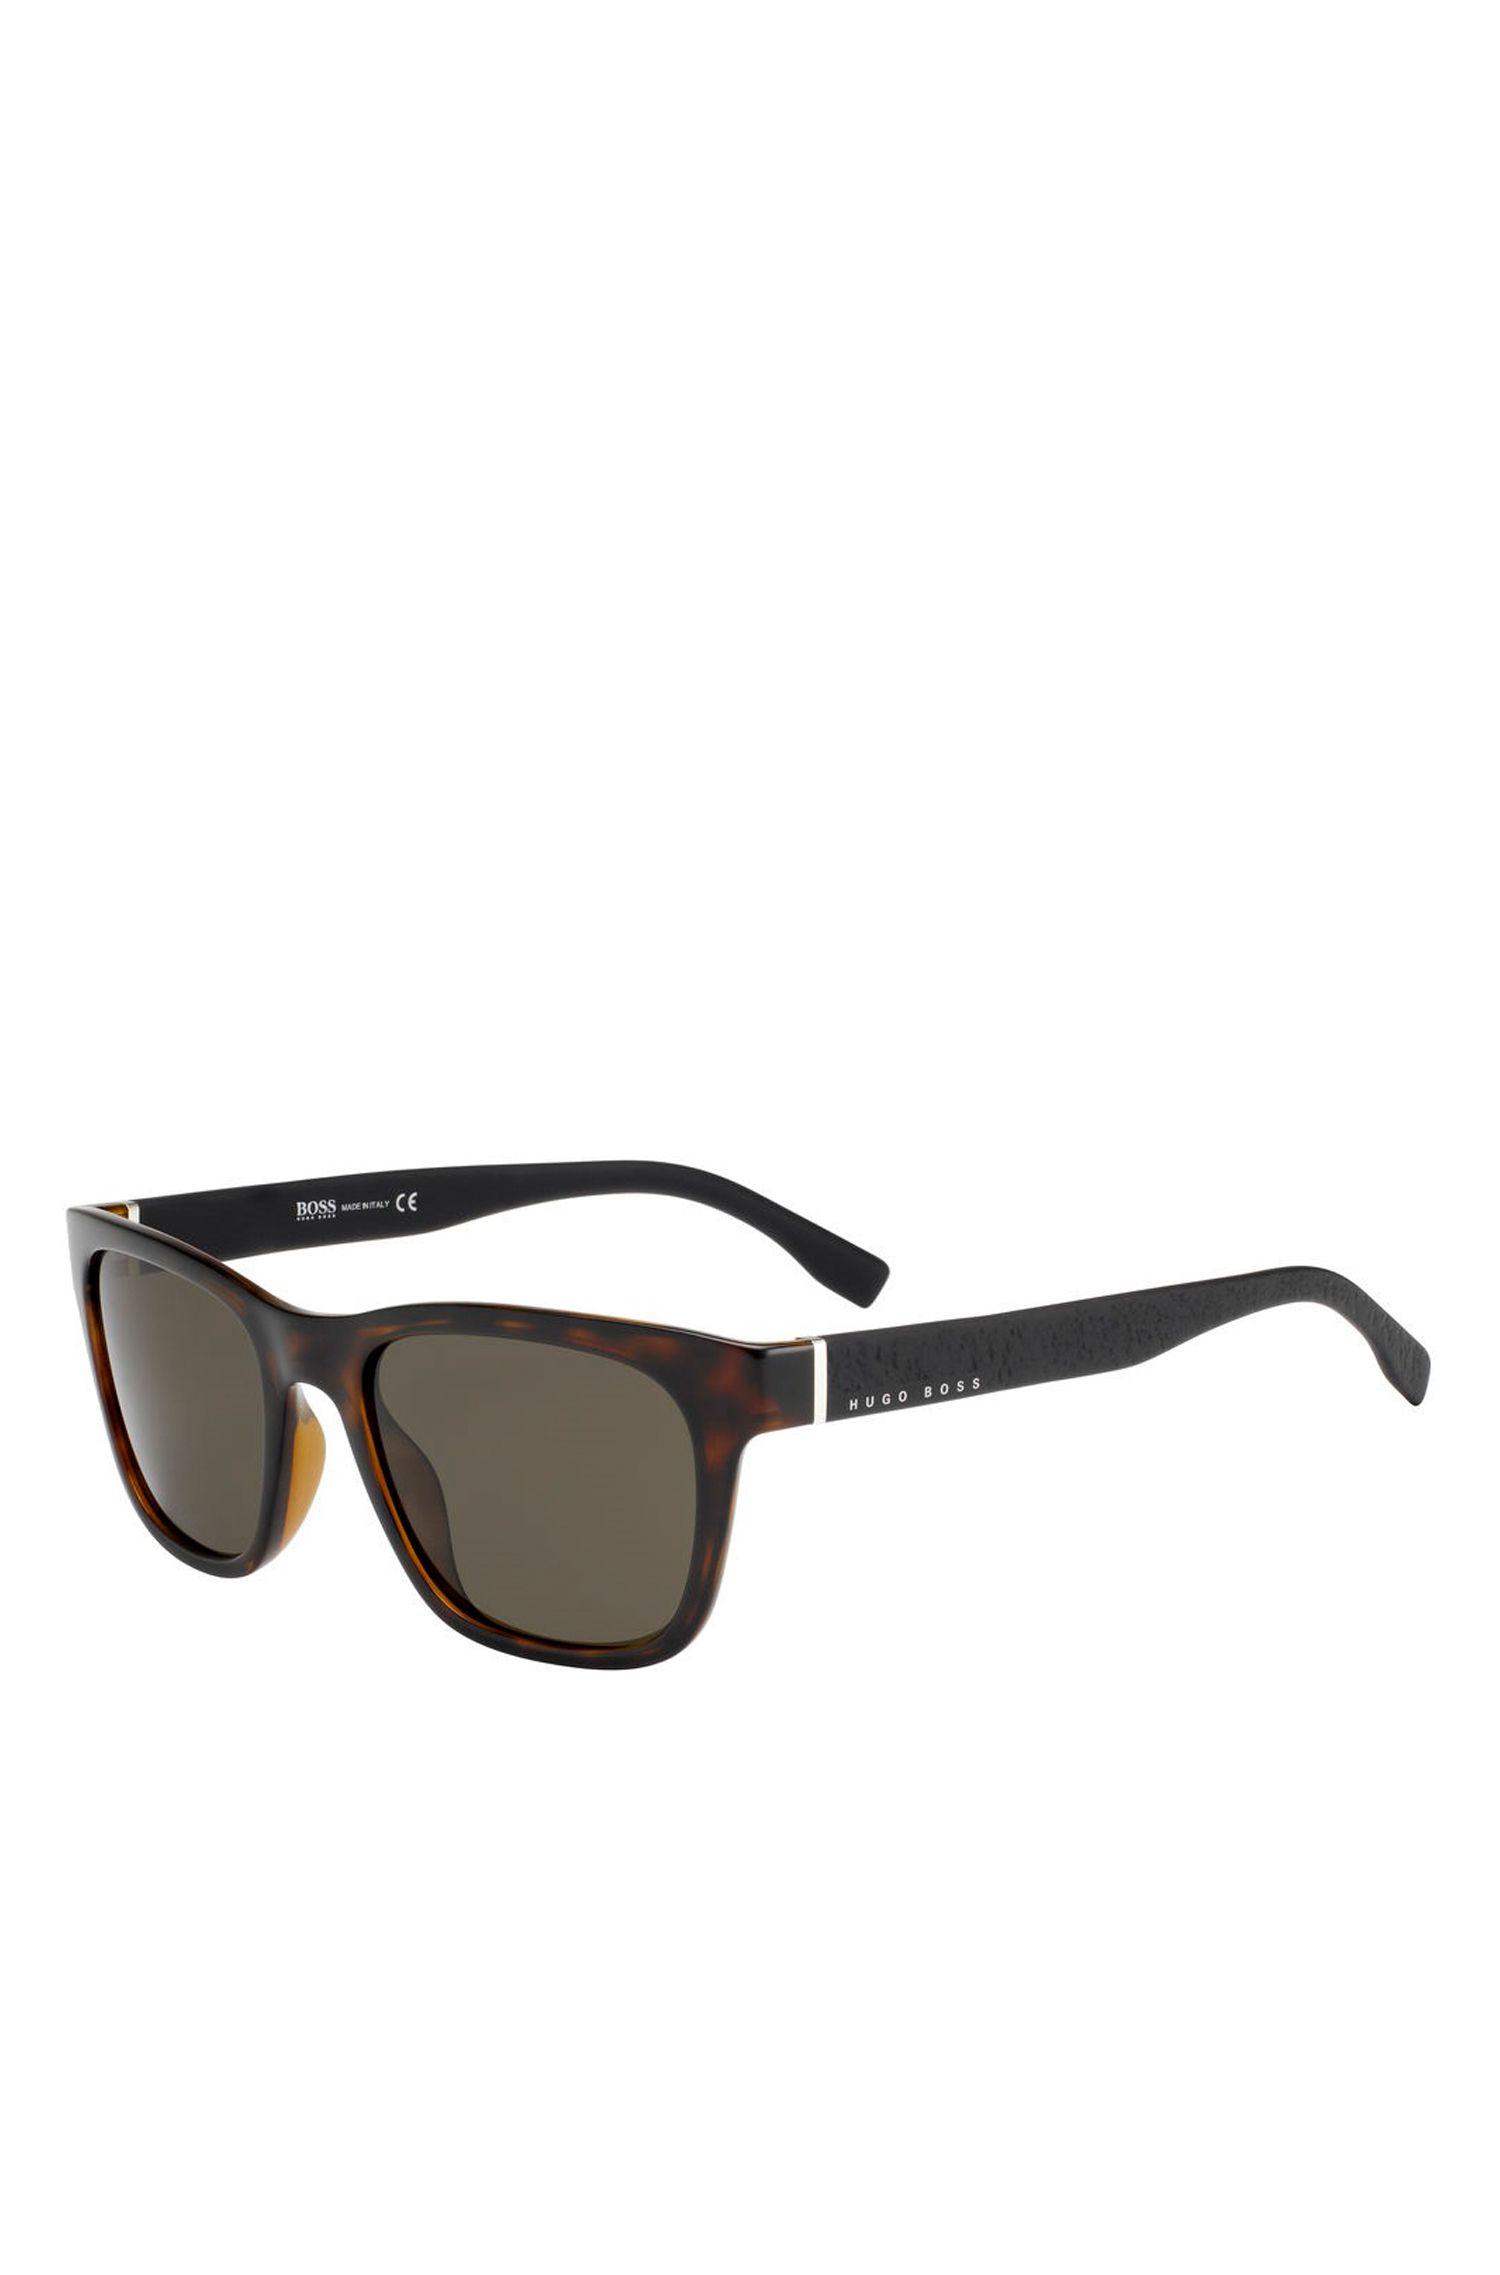 'BOSS 0830' | Black Lens Havana Square Sunglasses